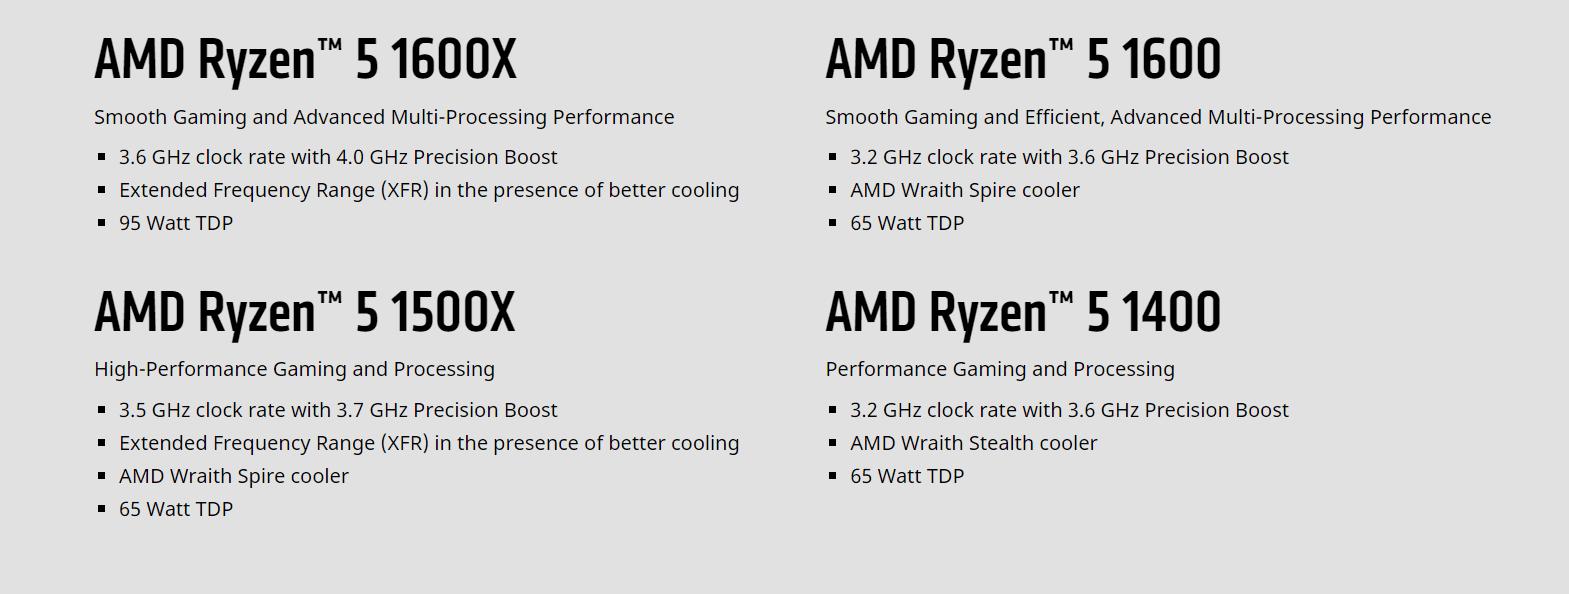 Amd Ryzen 5 Processors Specs